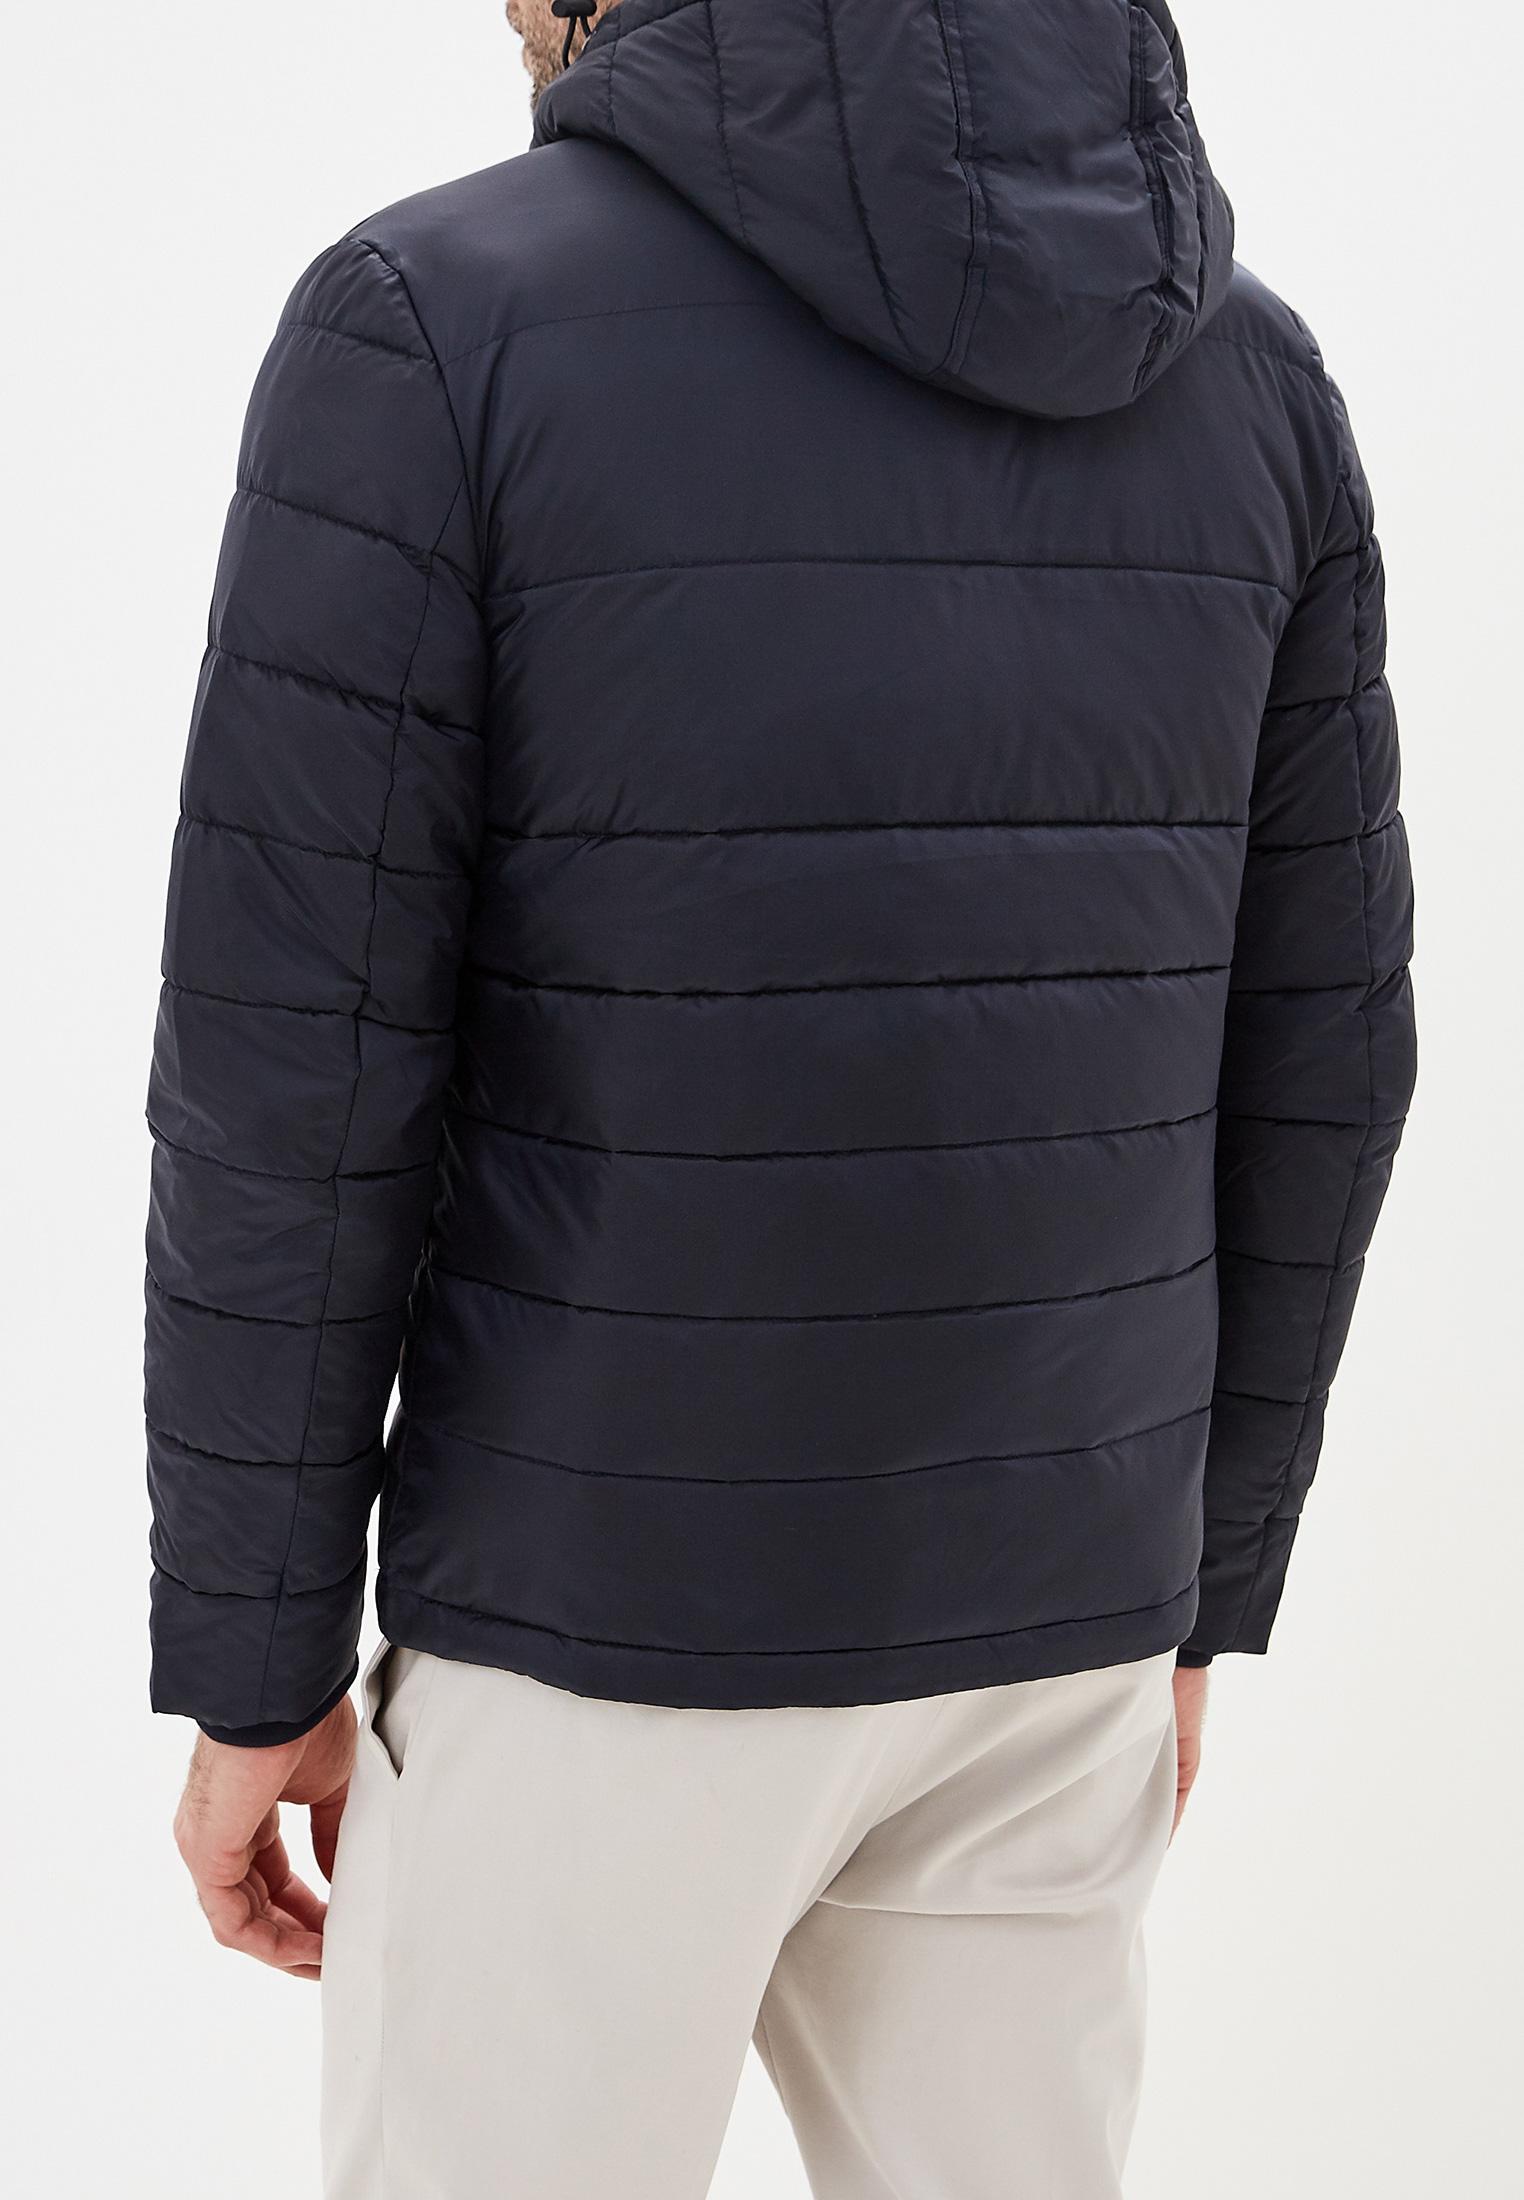 Куртка Tommy Hilfiger (Томми Хилфигер) MW0MW11947: изображение 3